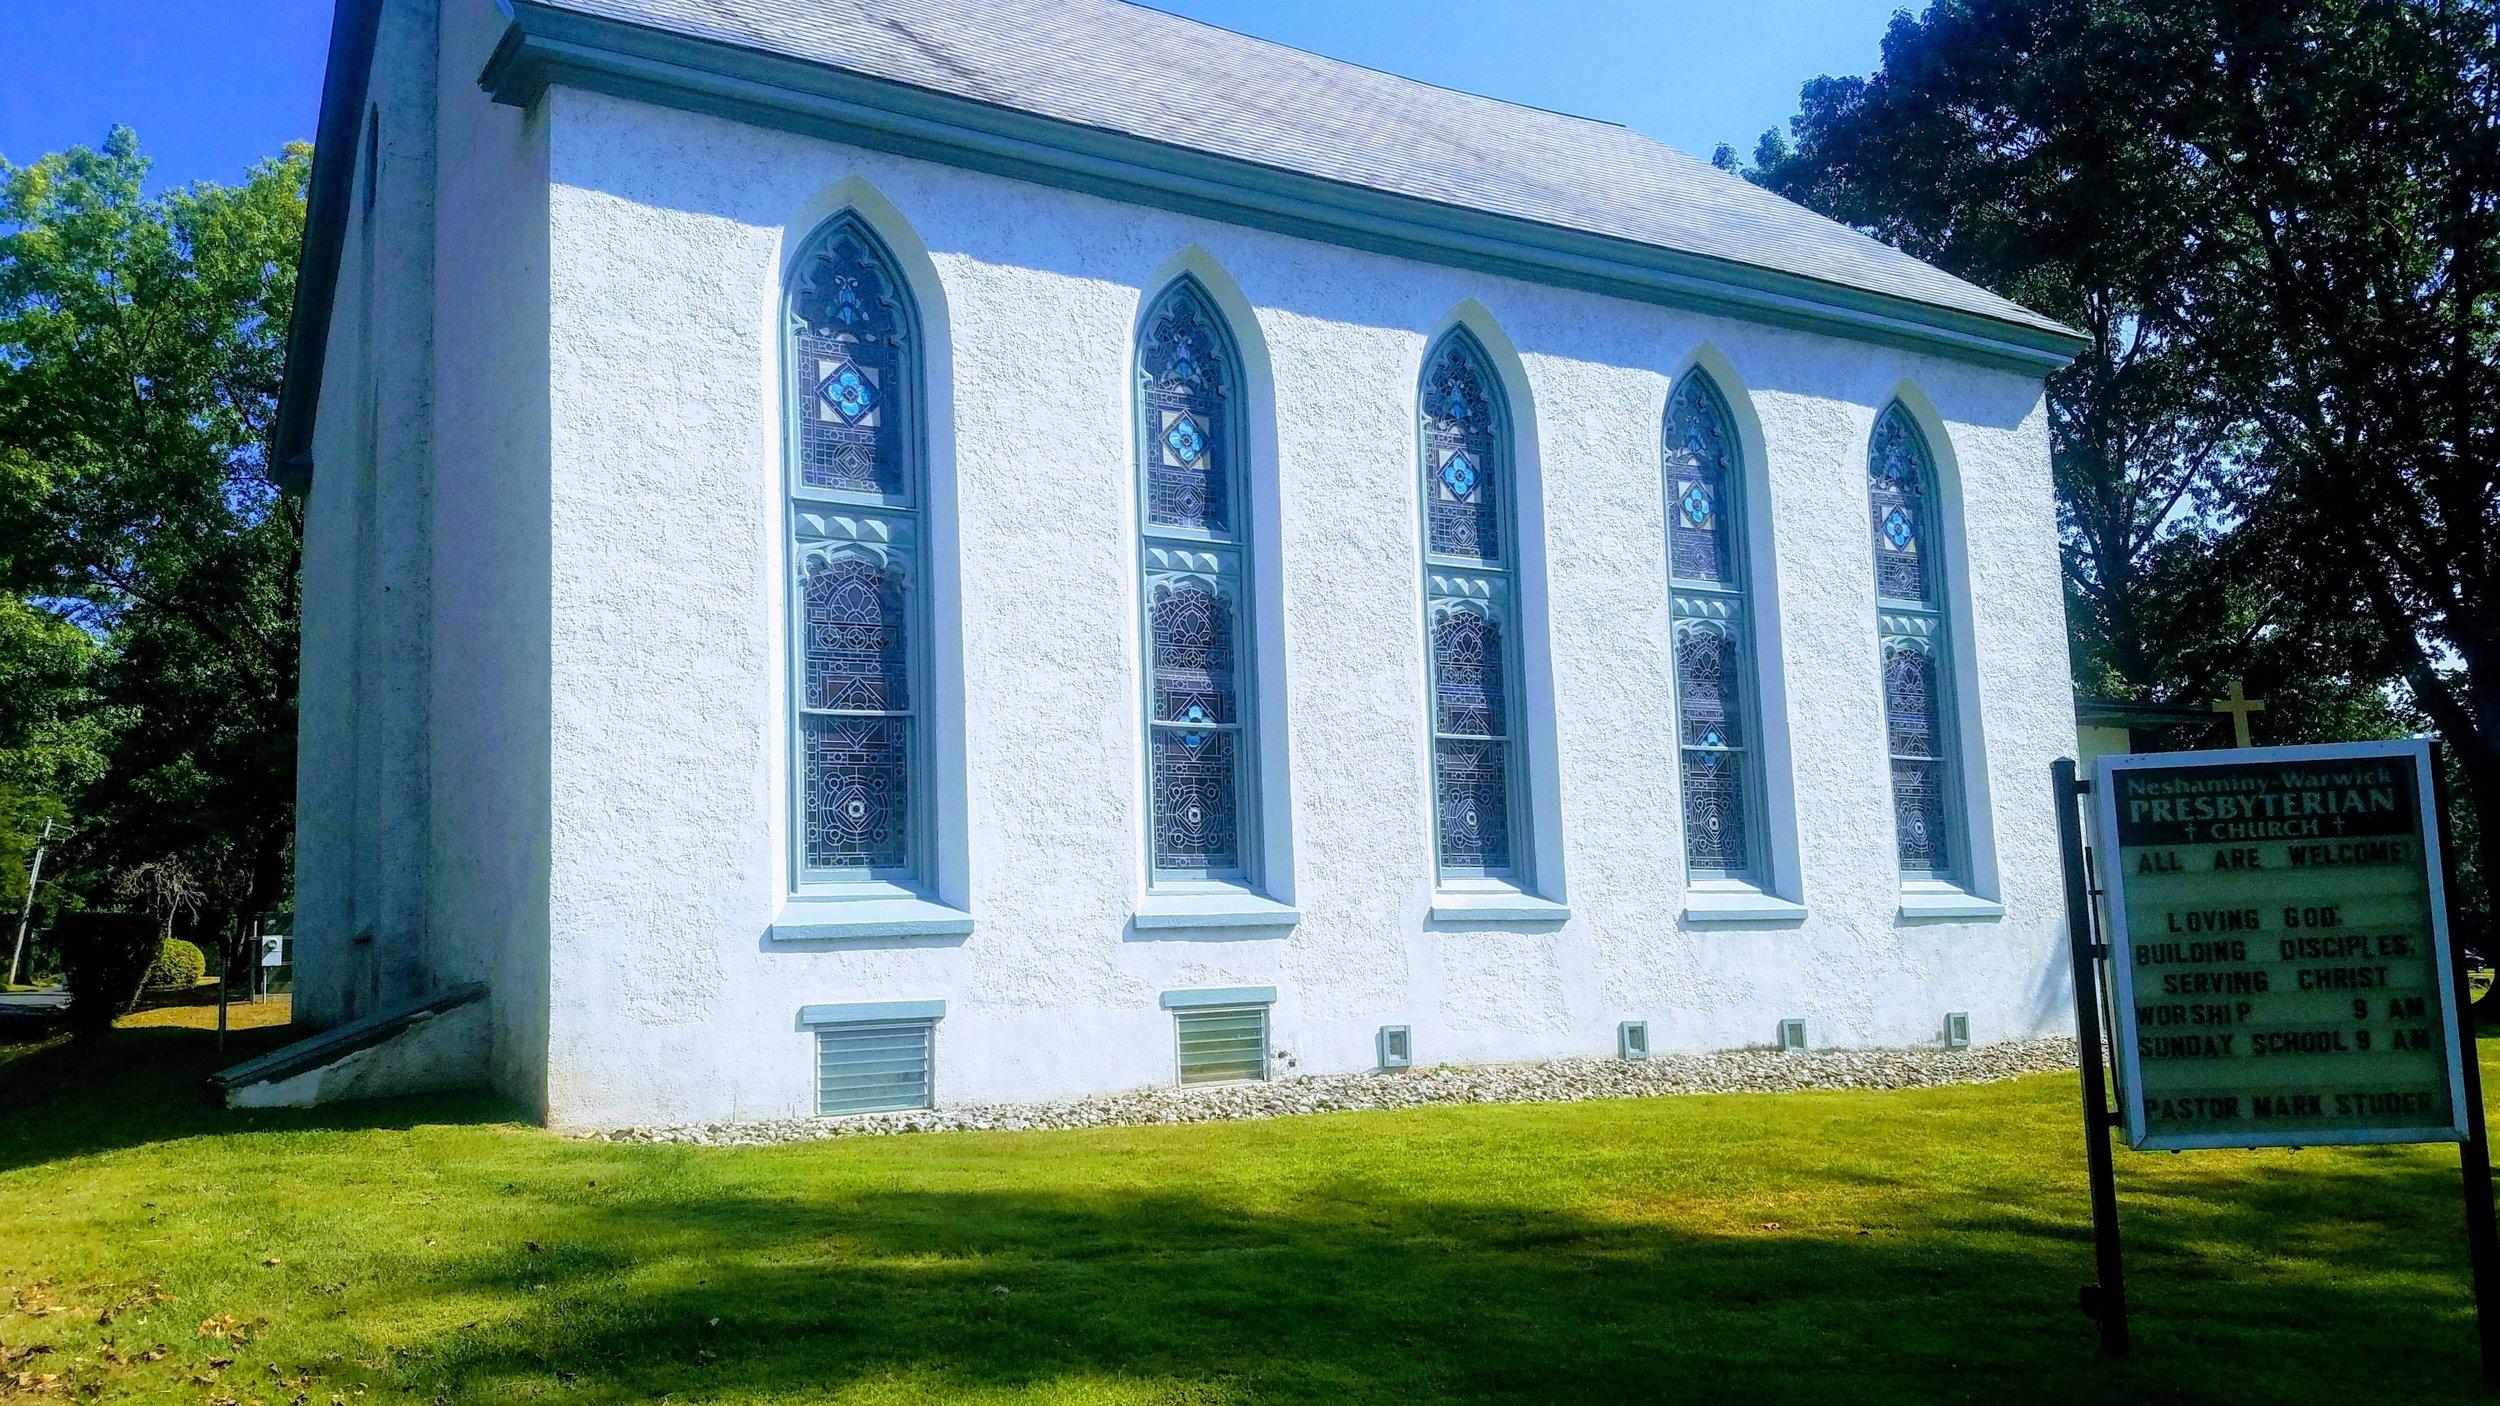 Neshaminy-Warwick Presbyterian Church (photo credit: R. Andrew Myers).